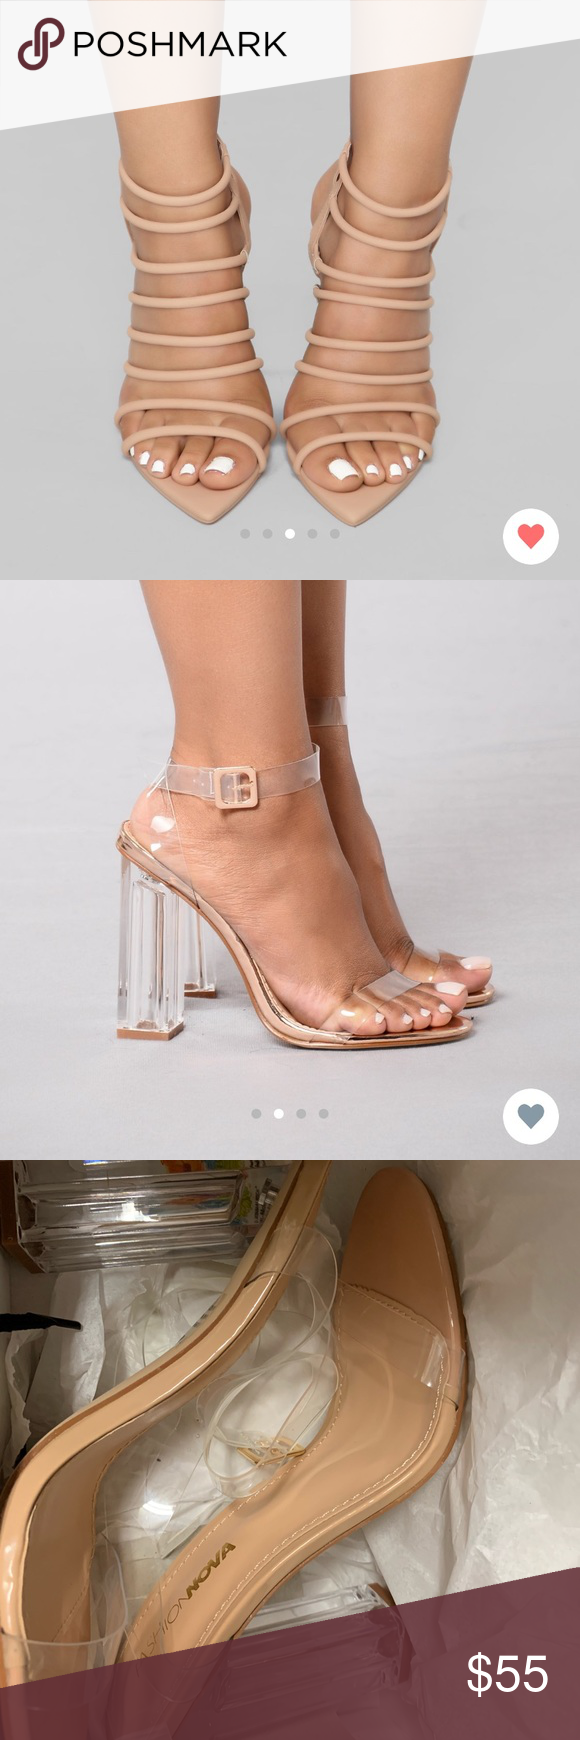 Cute heels, Fashion nova shoes